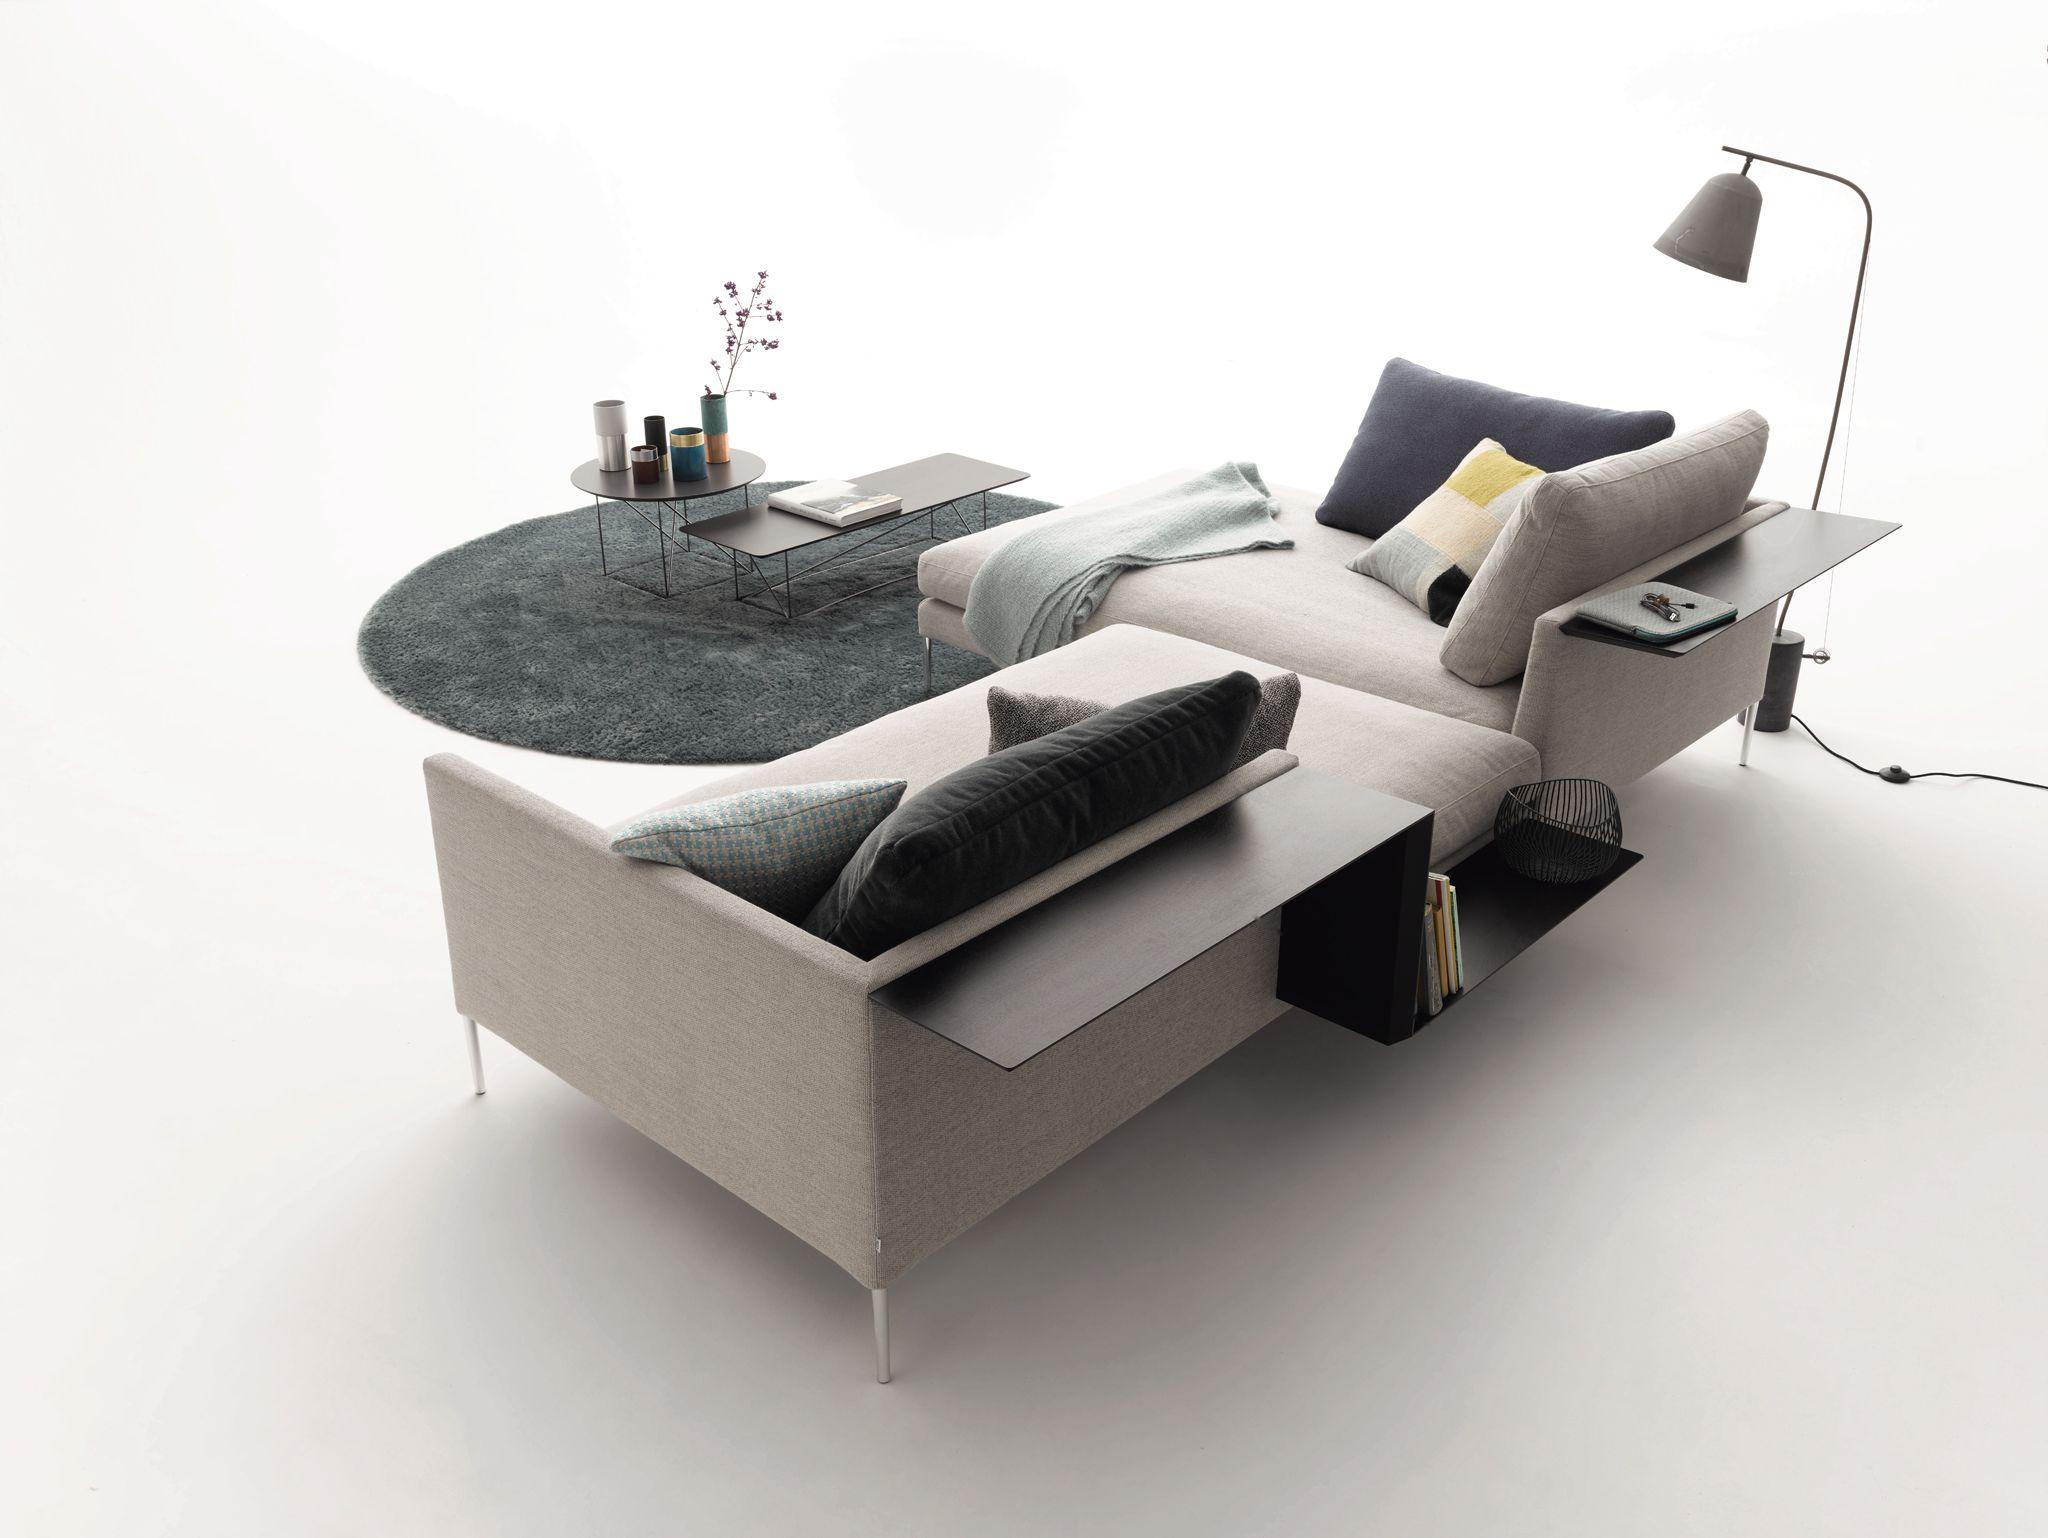 pilotis sofa aus stoff kollektion pilotis by cor sitzm bel helmut l bke design metrica. Black Bedroom Furniture Sets. Home Design Ideas